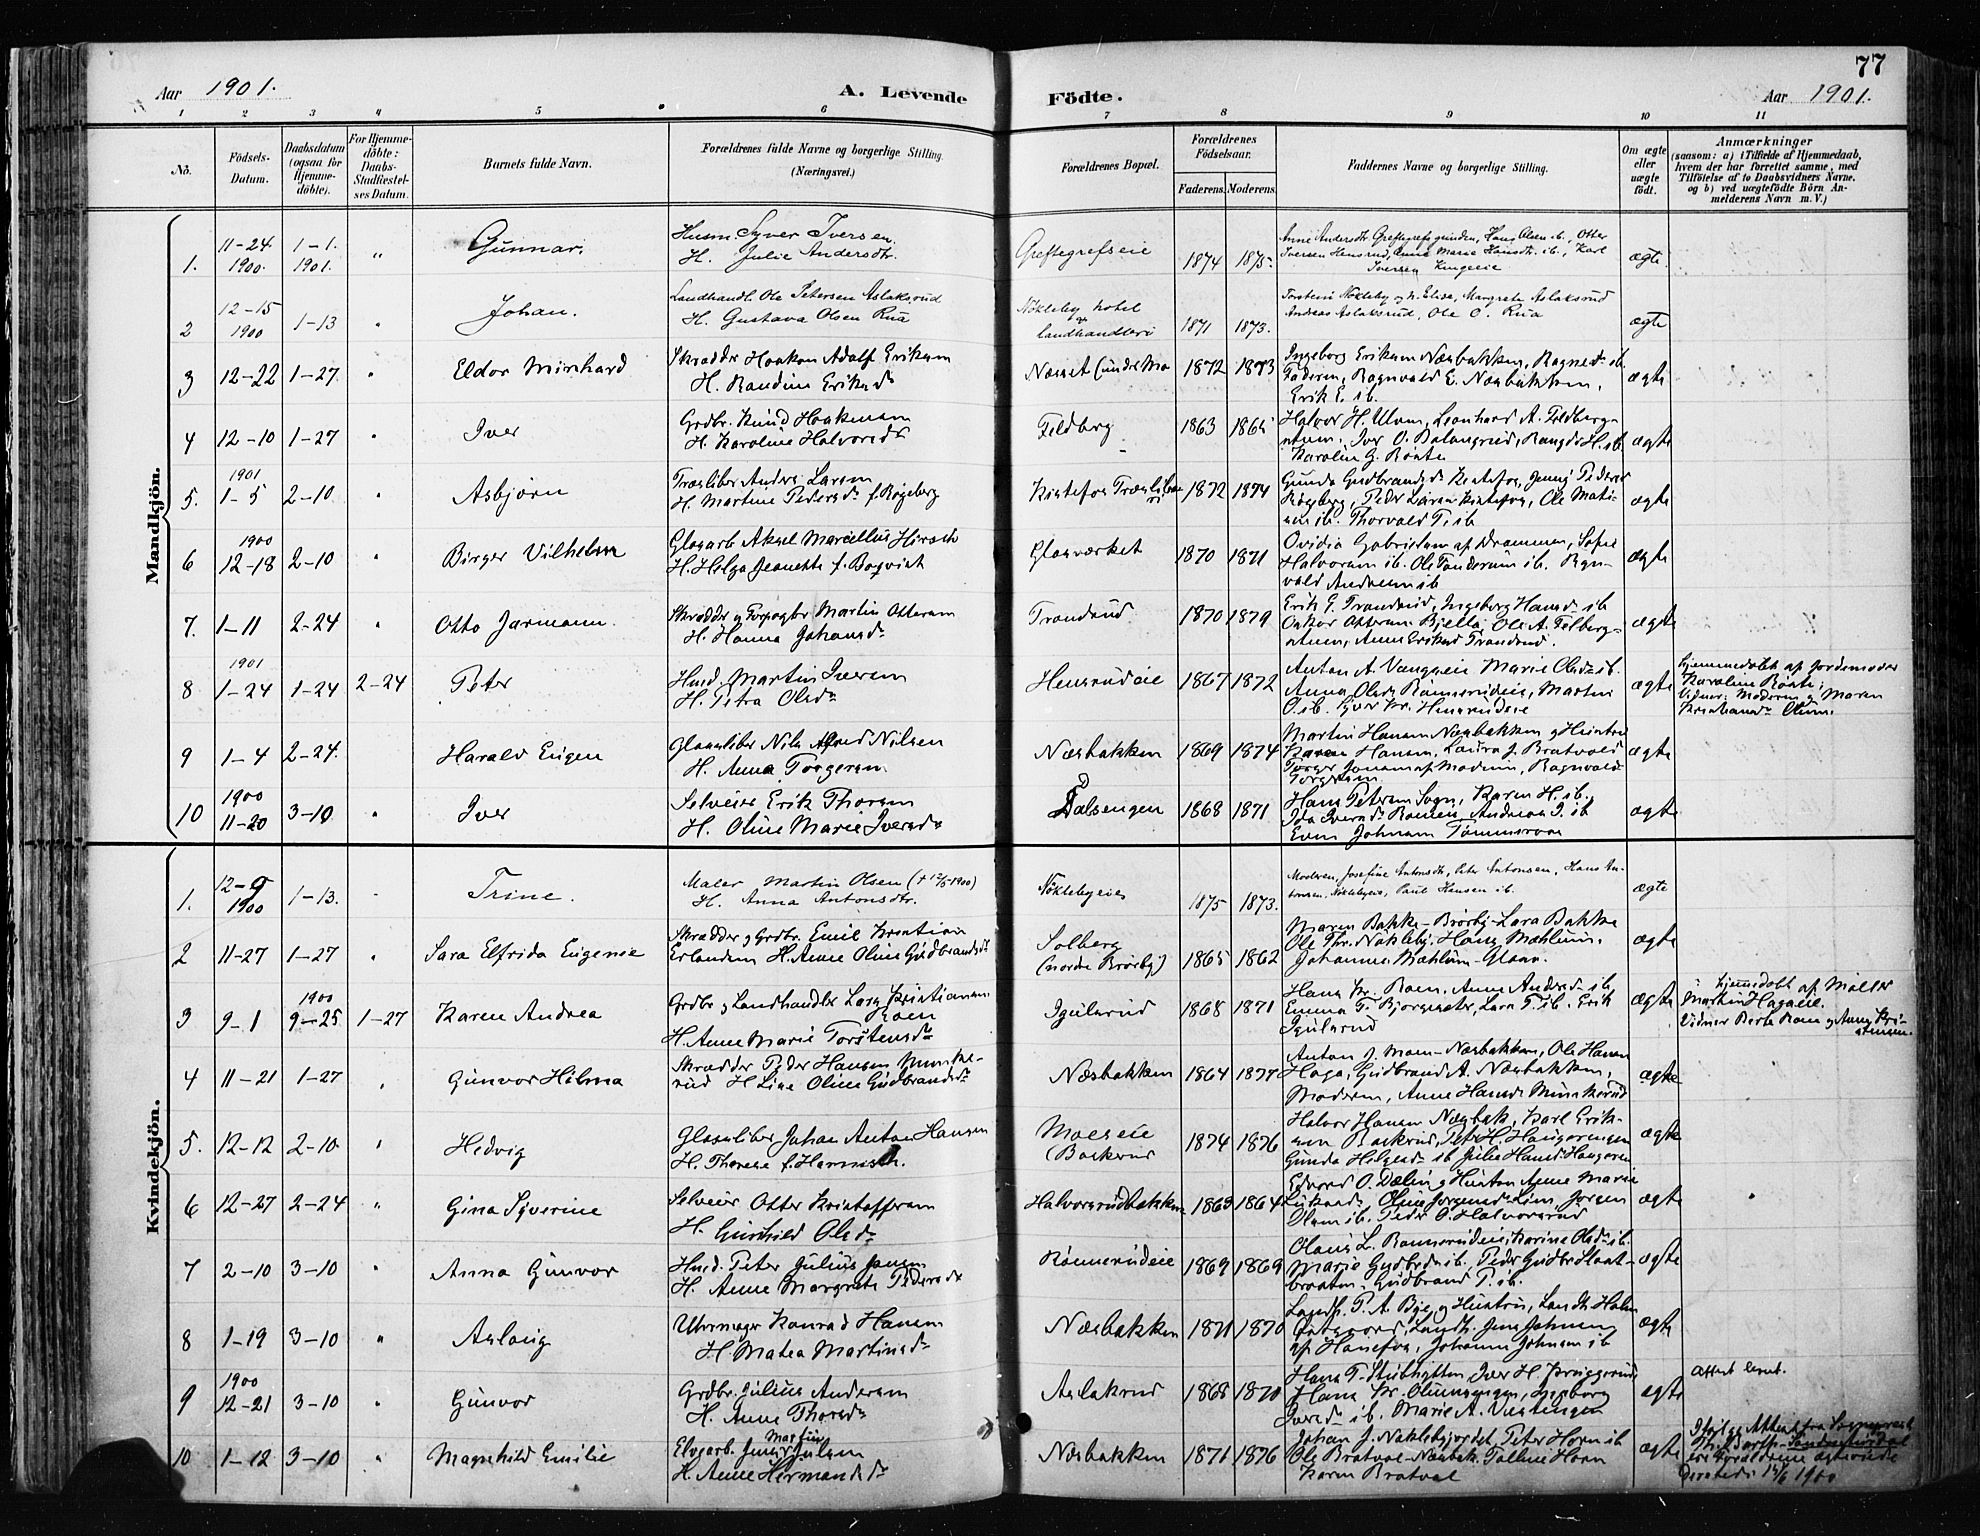 SAH, Jevnaker prestekontor, Ministerialbok nr. 9, 1891-1901, s. 77